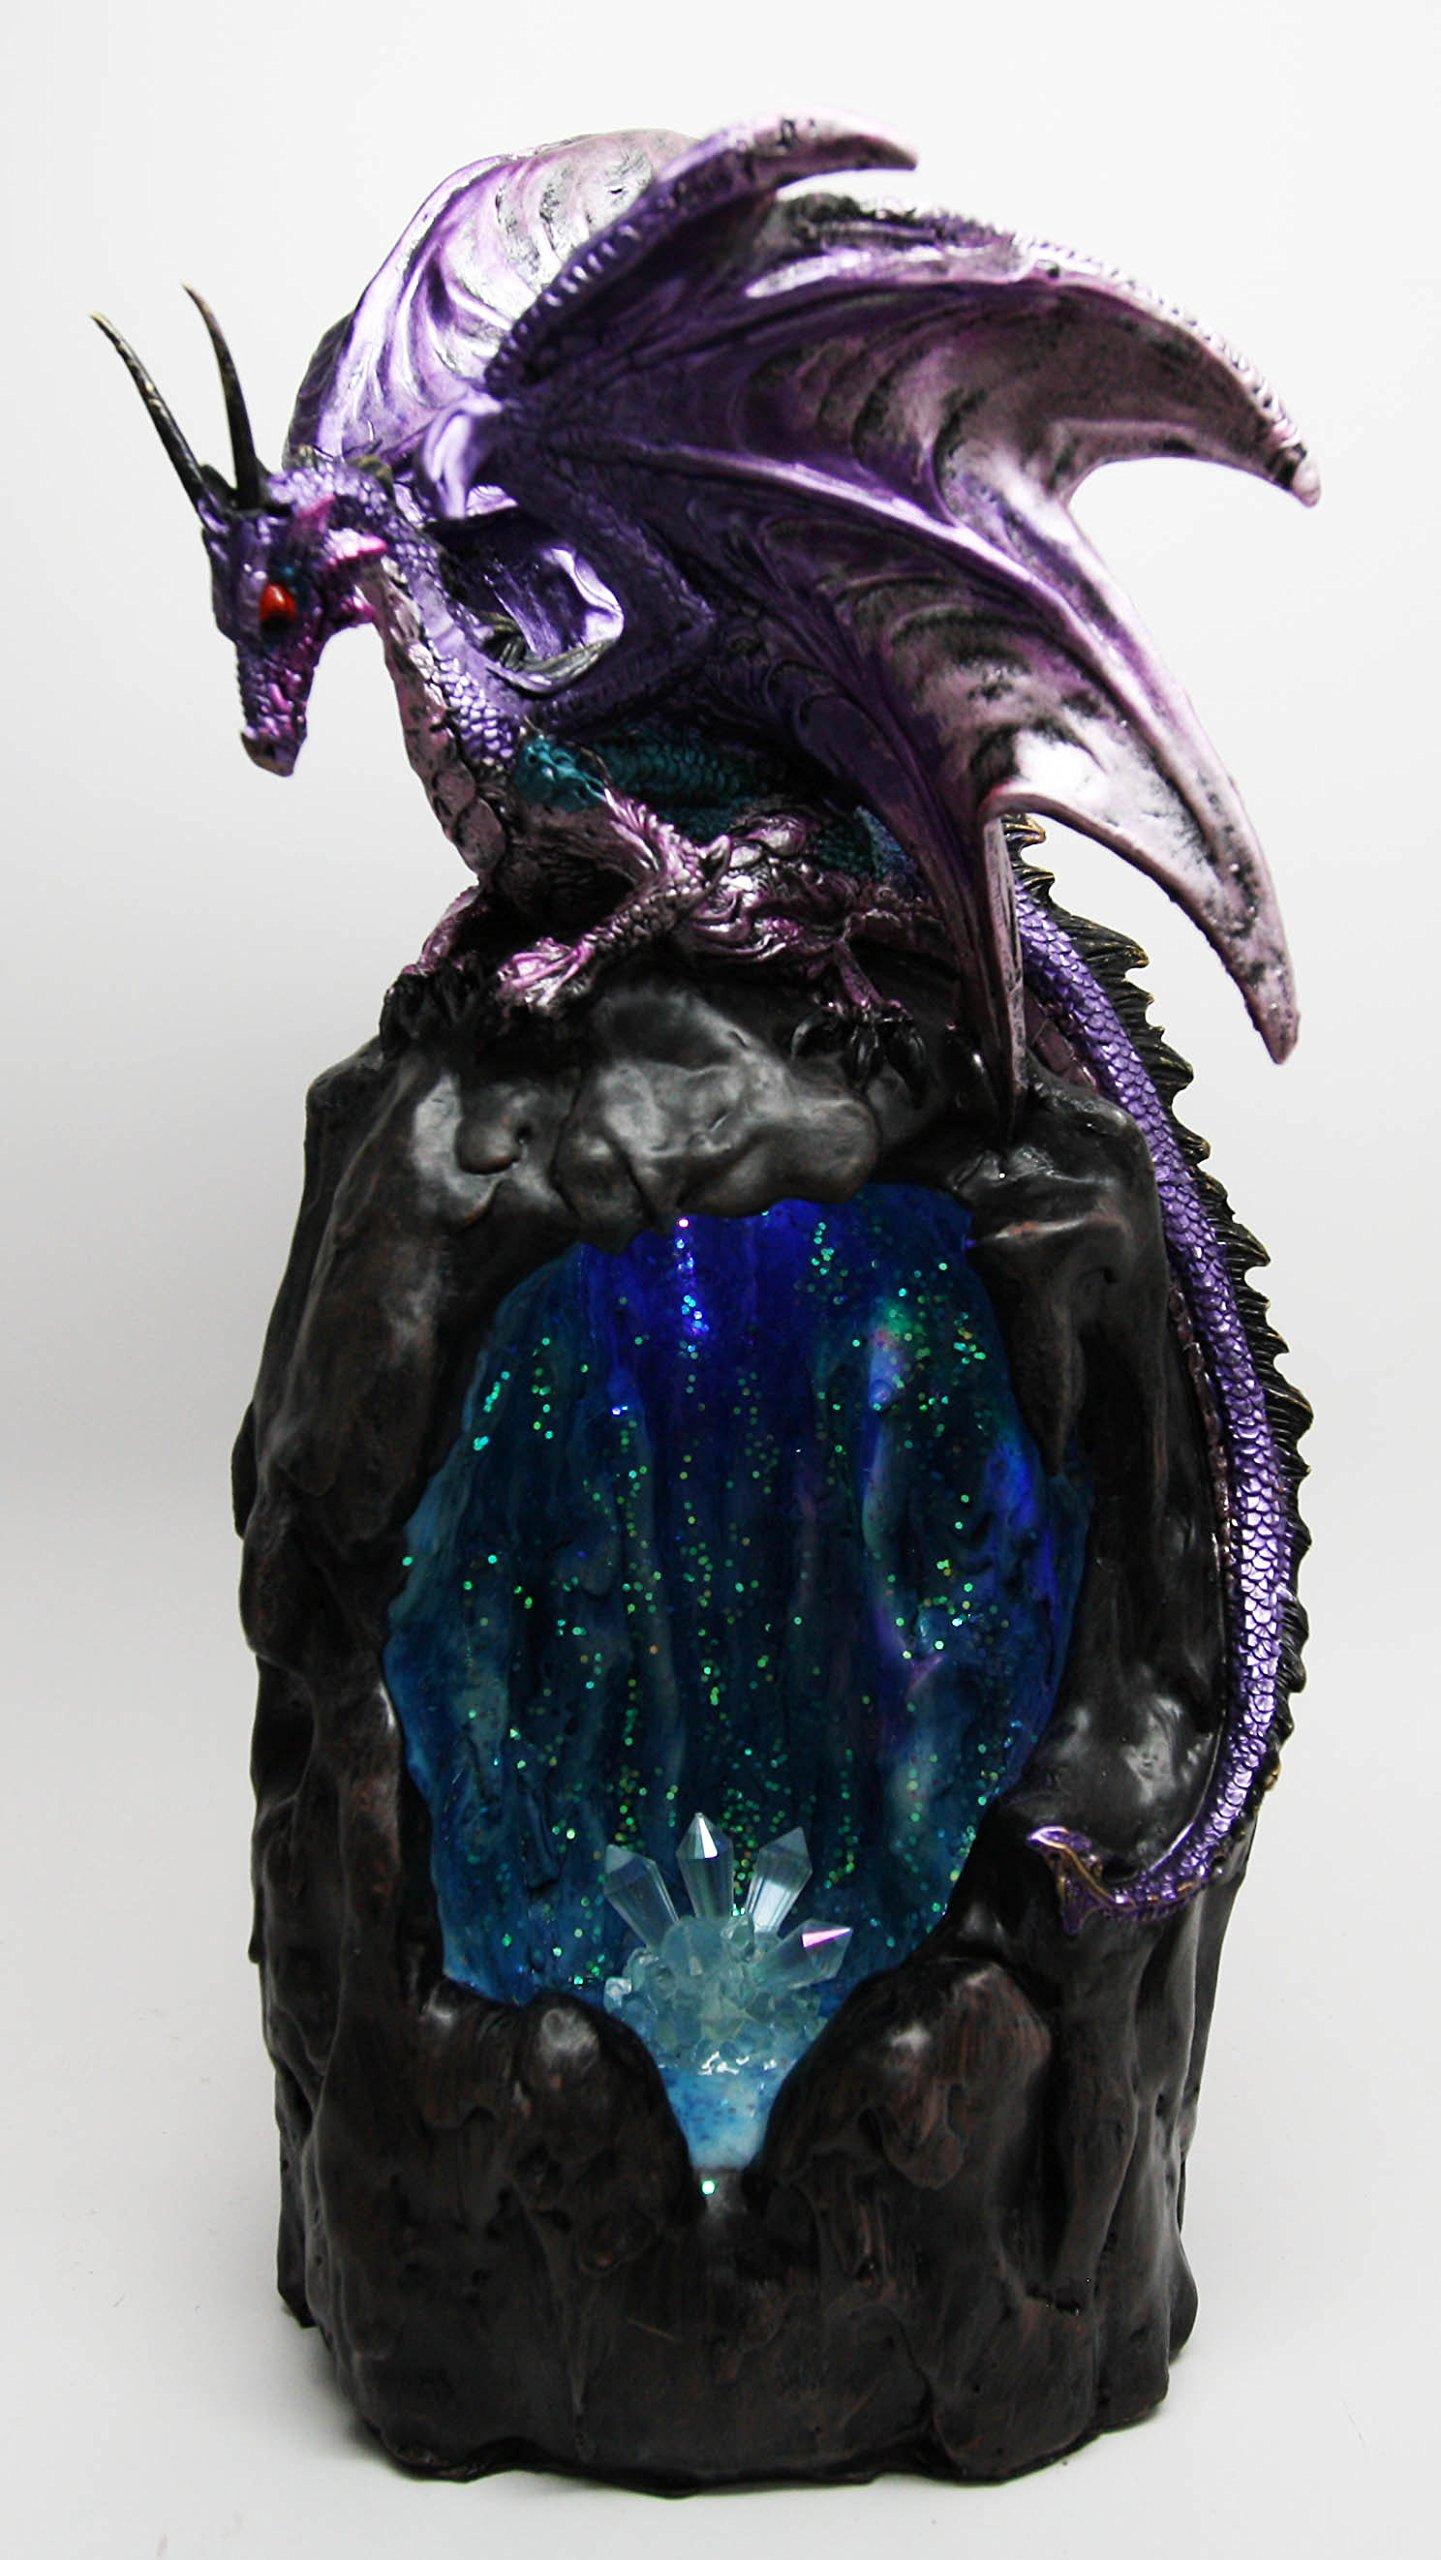 Ebros Purple Azurite Quartz Dragon Climbing On Gemstone Mountain Backflow Incense Burner Figurine Faux Stone by Ebros Gift (Image #7)